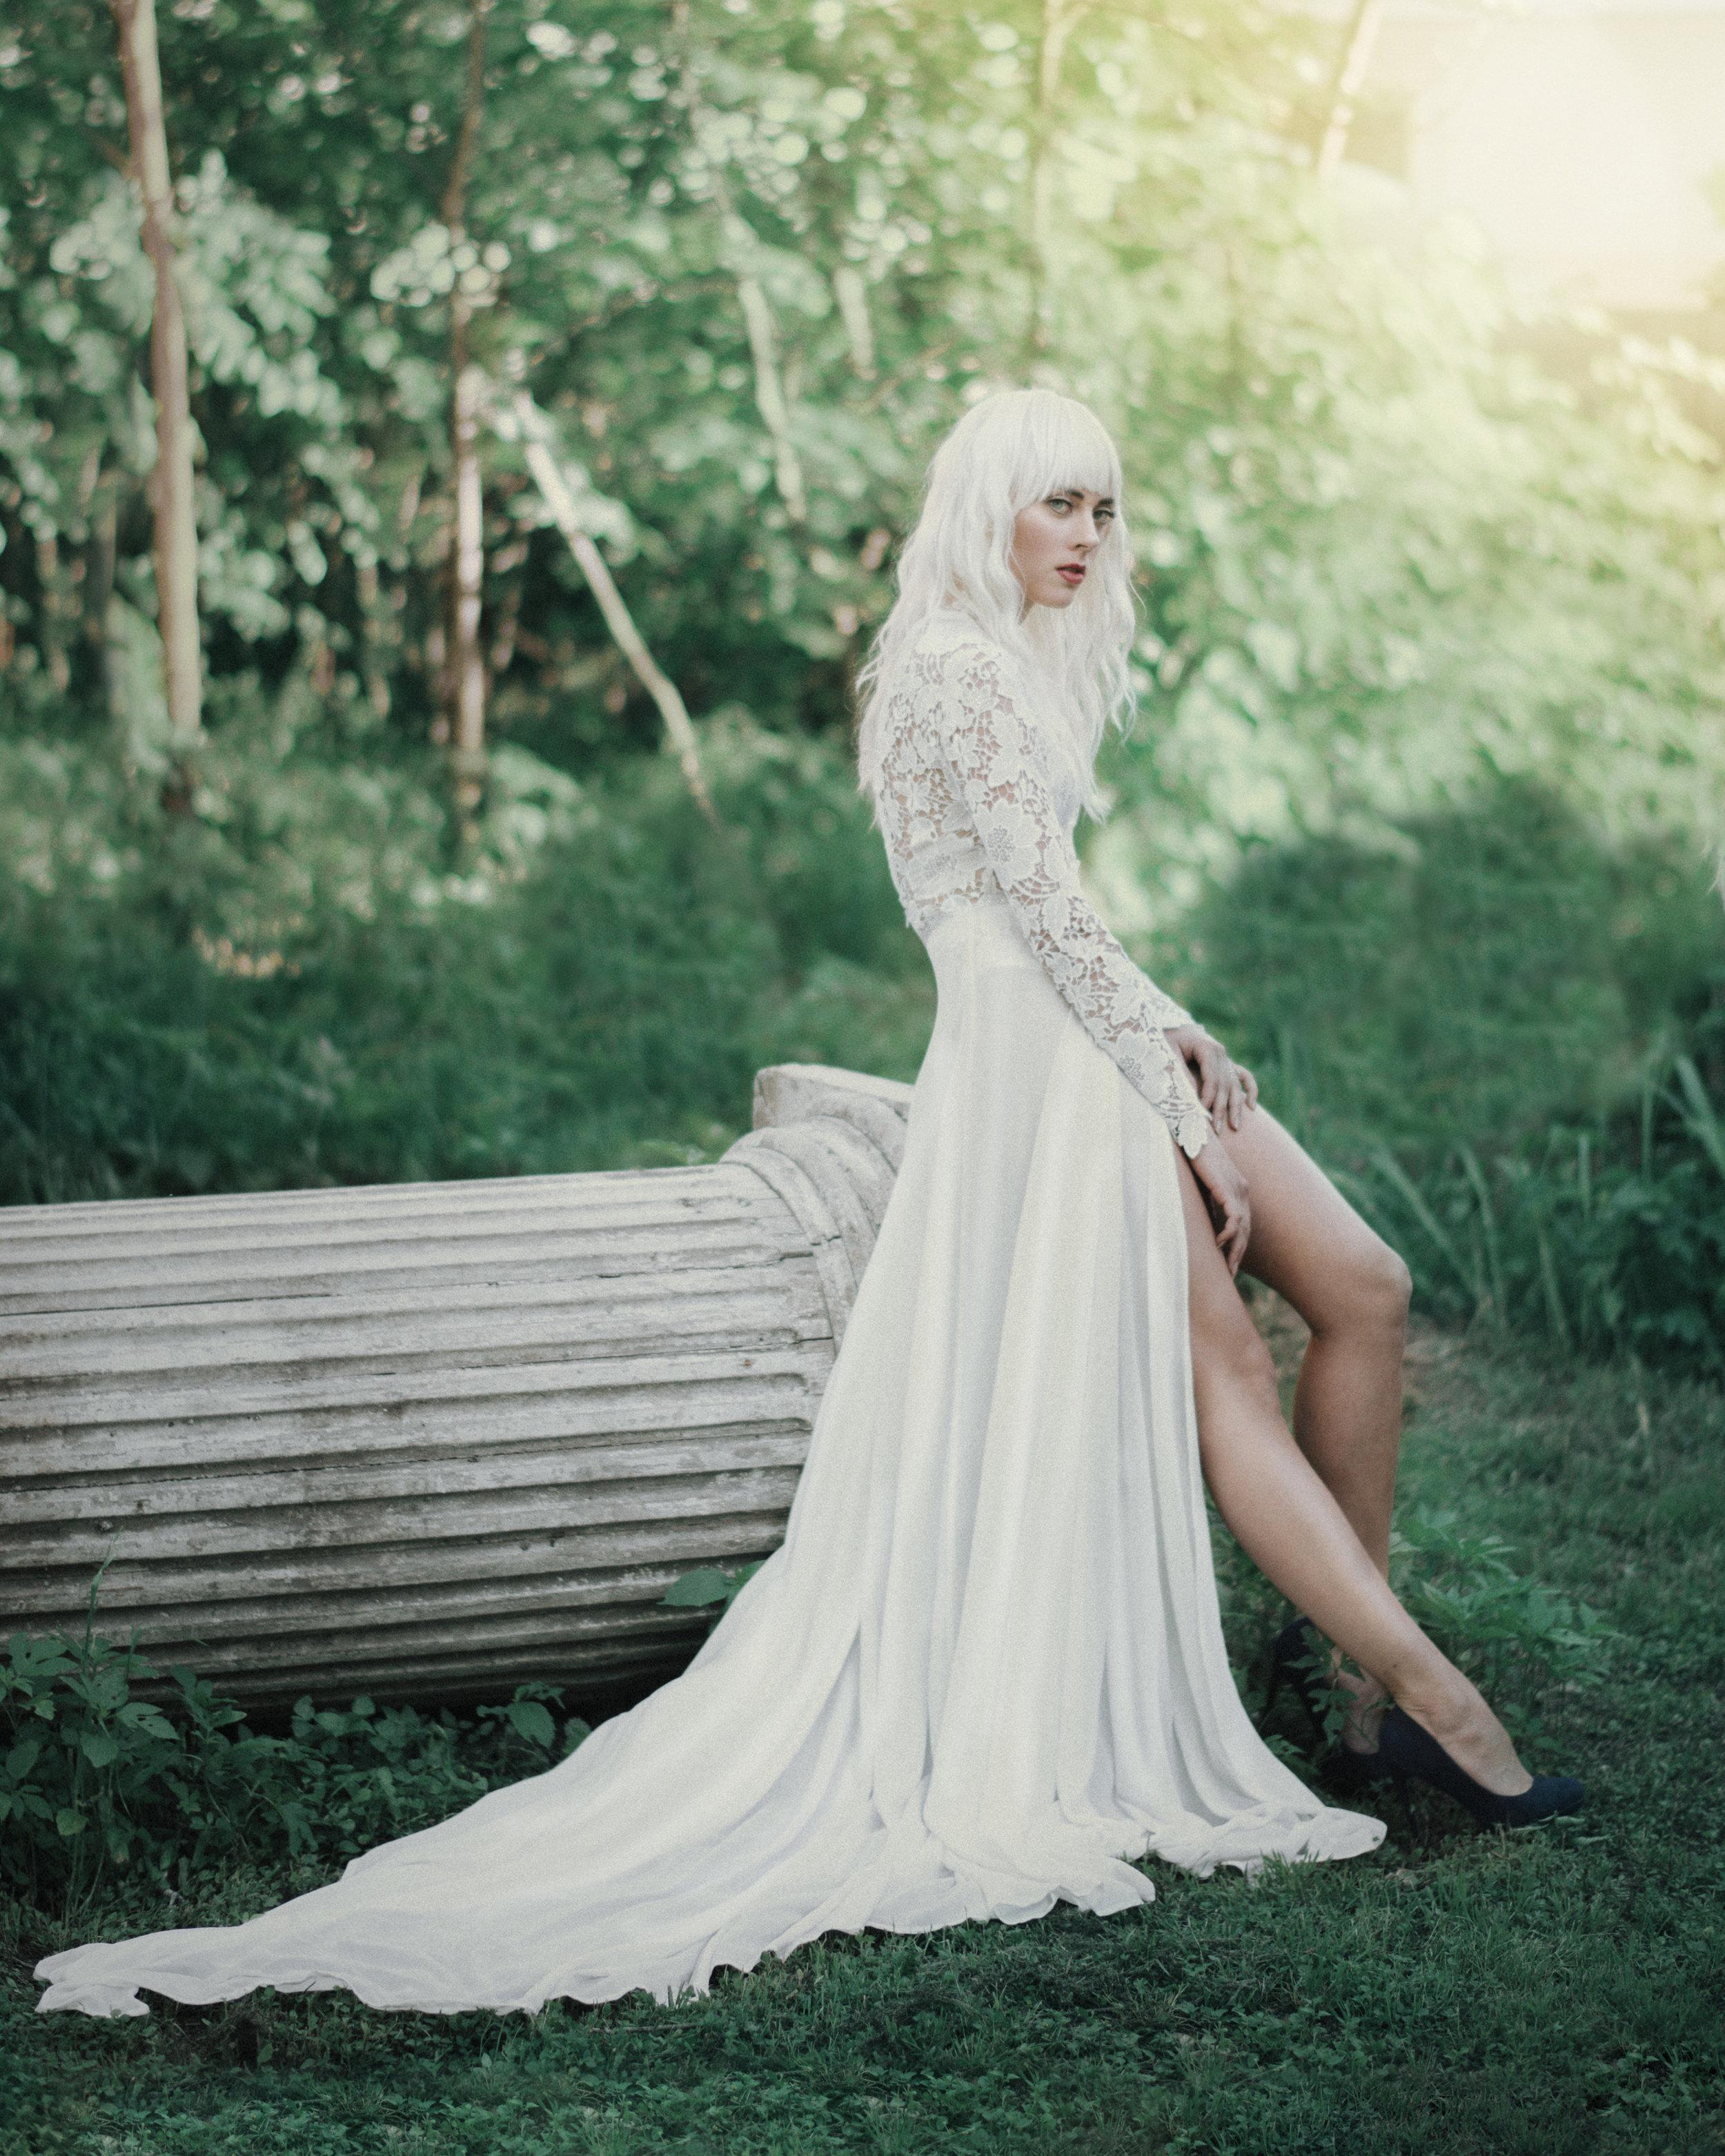 austin fashion photographer obsidian and blush.jpg